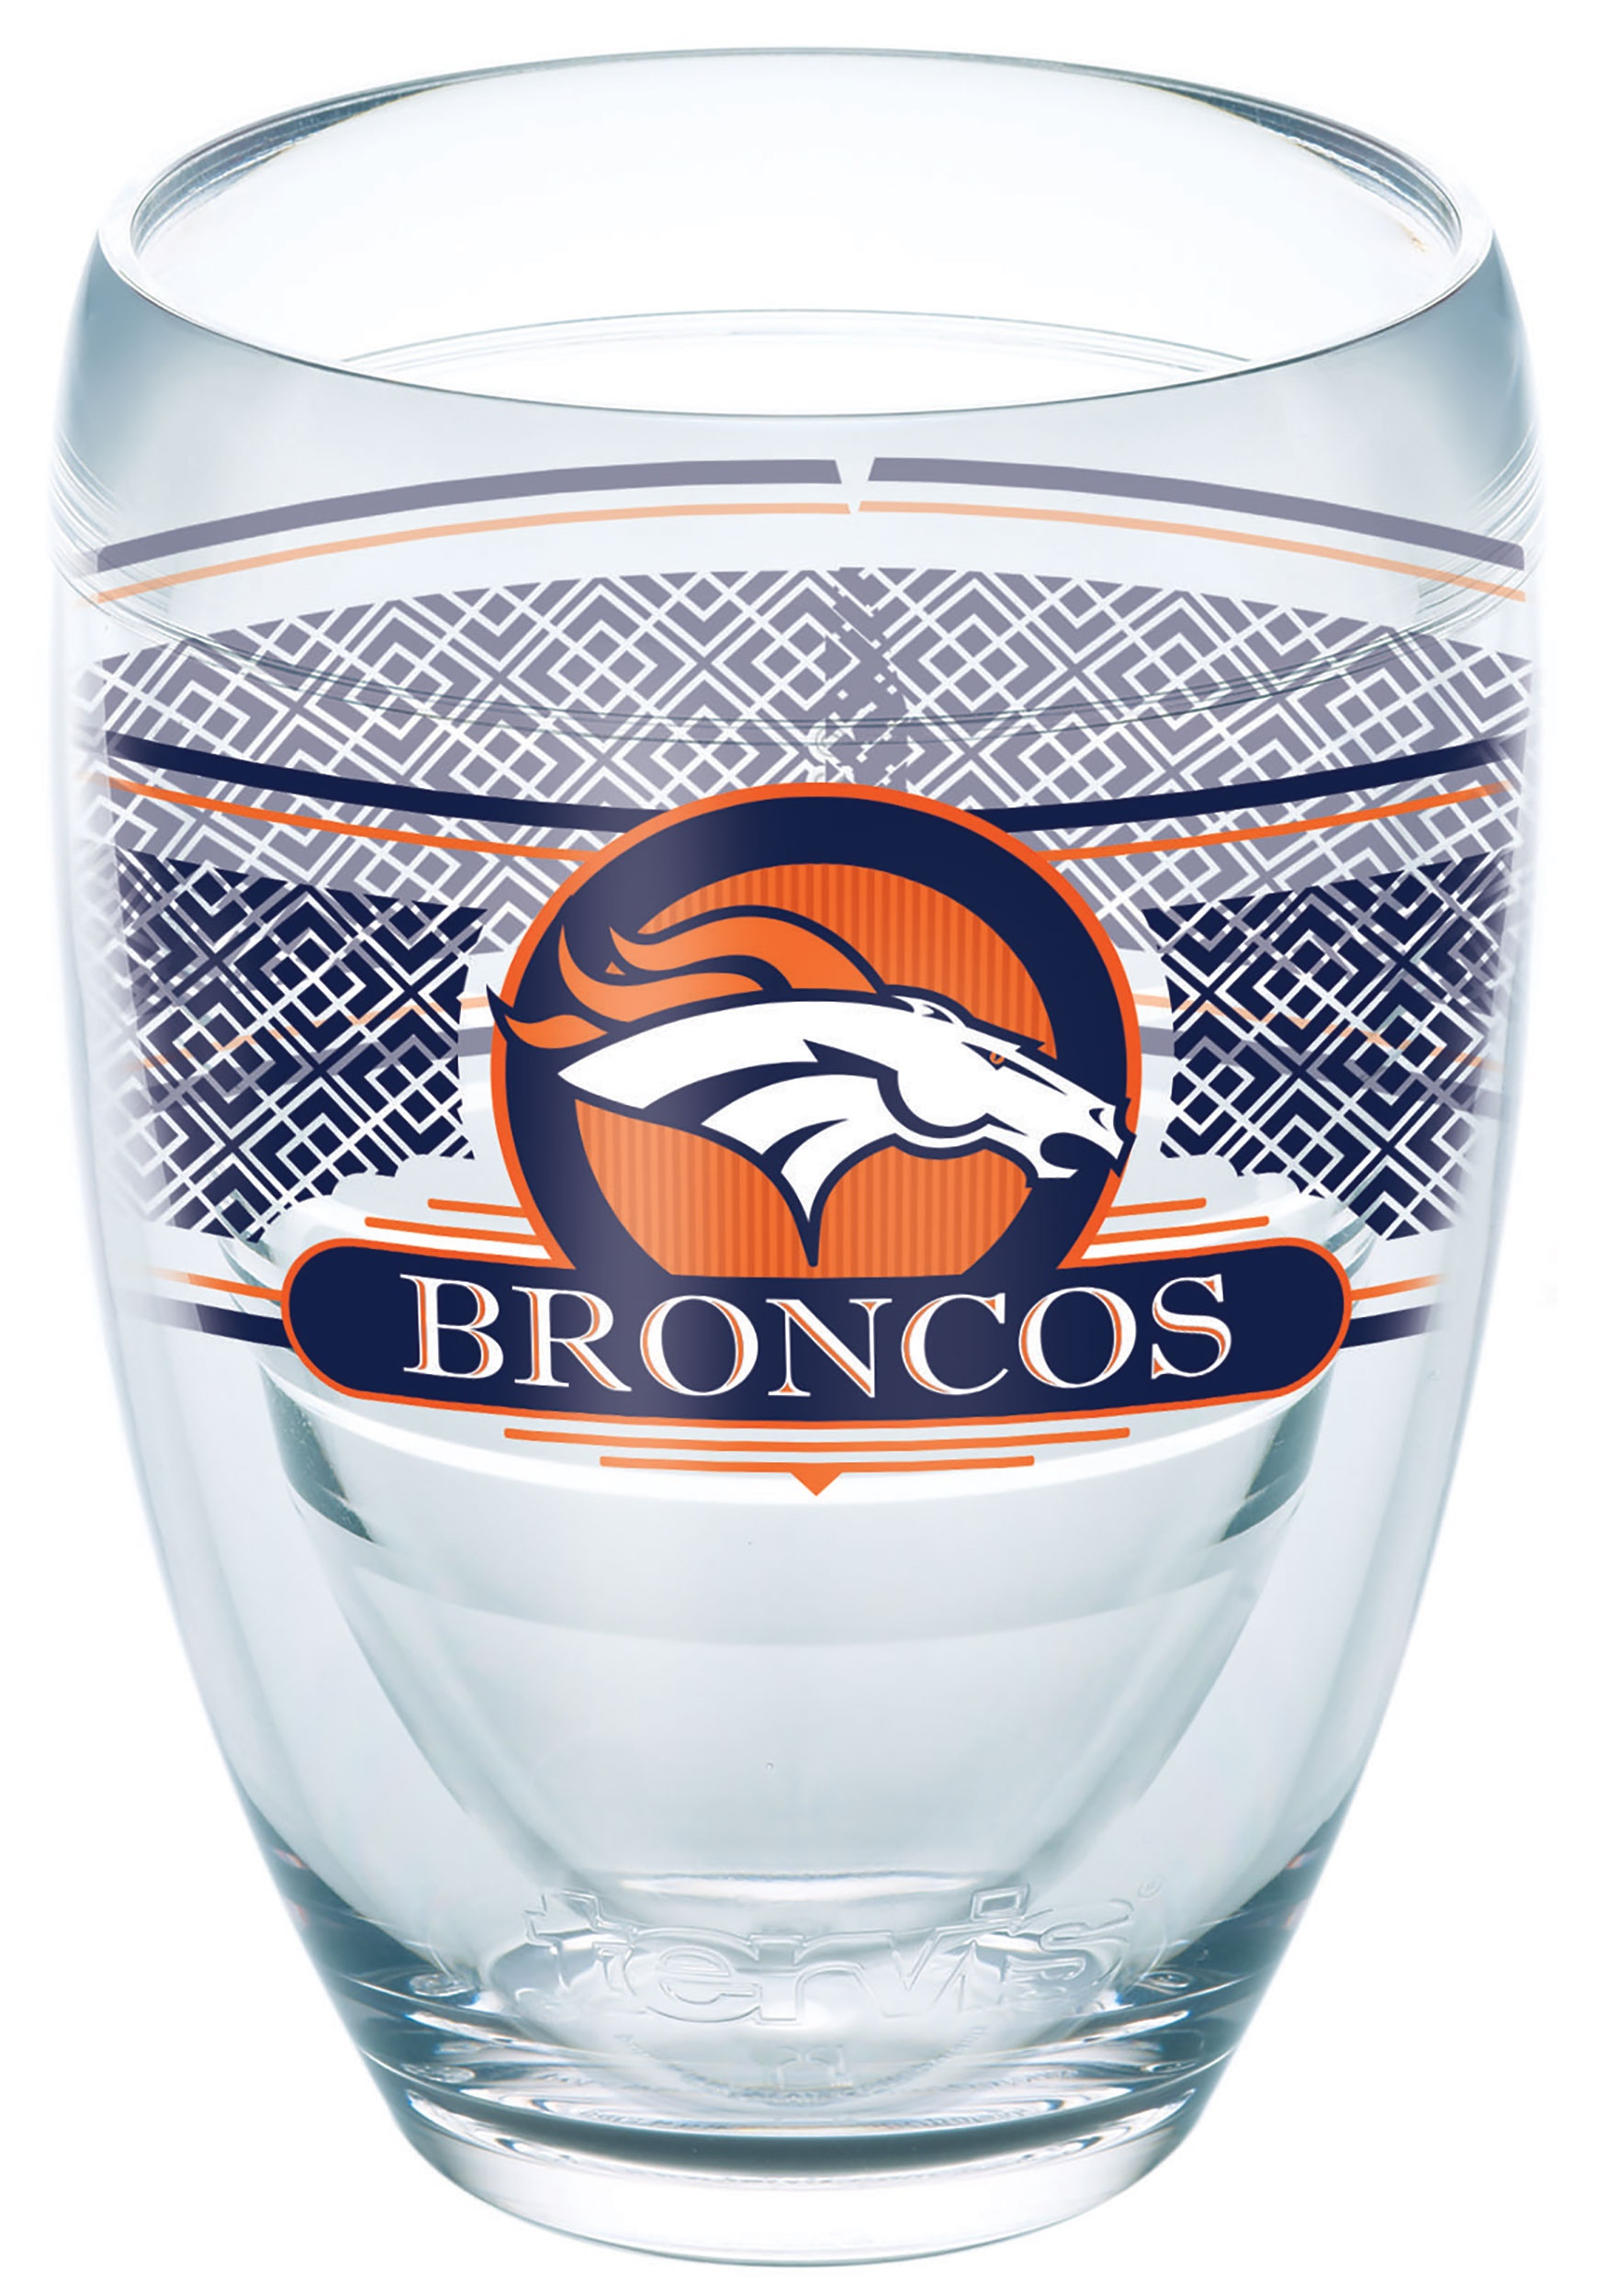 Tervis NFL Denver Broncos 9 oz Stemless Wine Glass